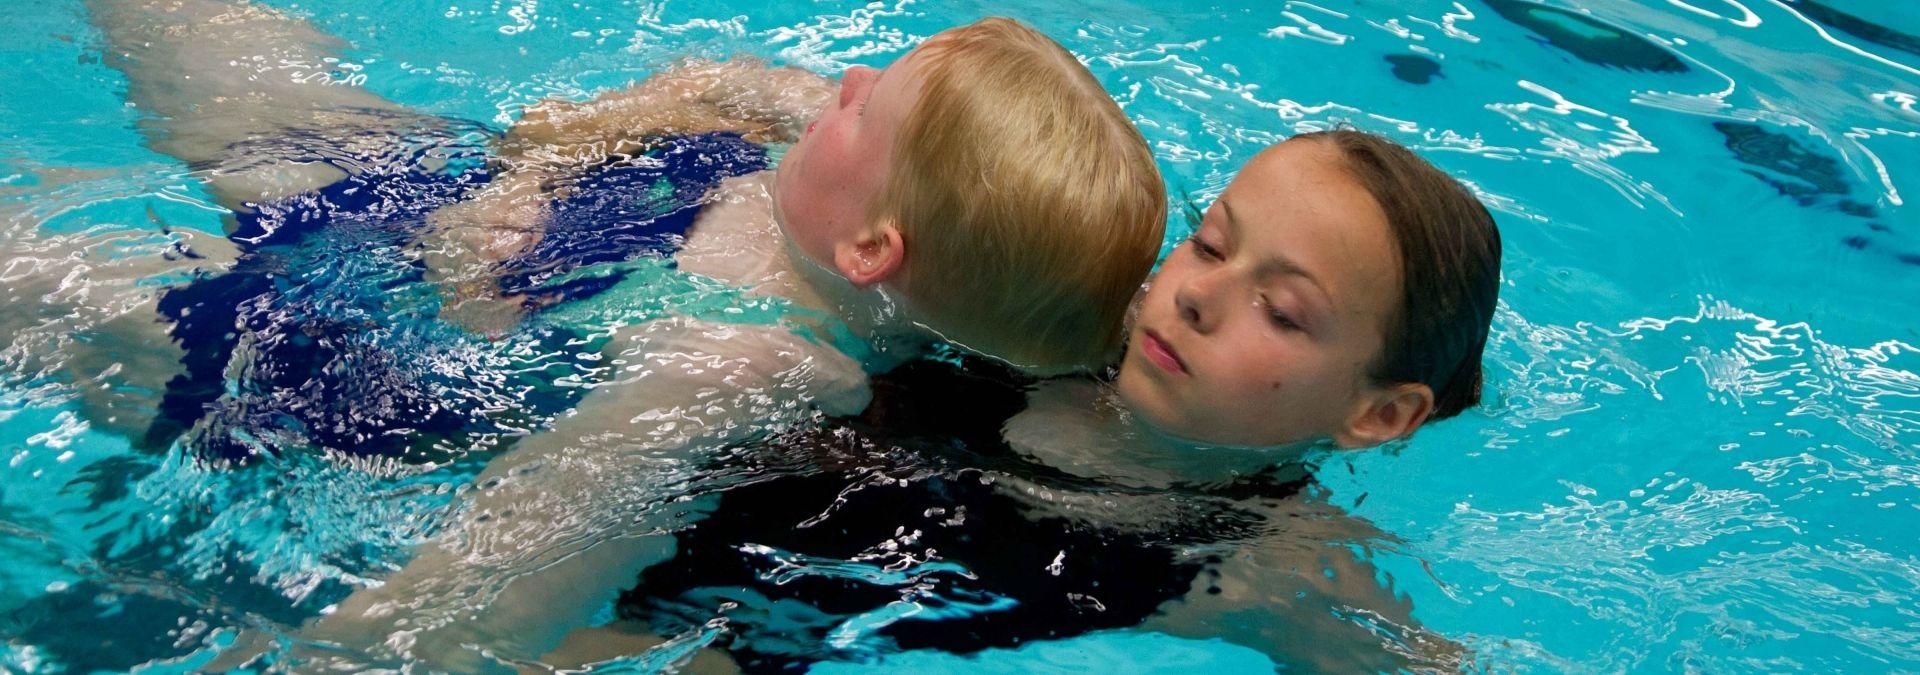 Reddingsbrigade zwemmend redden opleiding drenkeling slepen